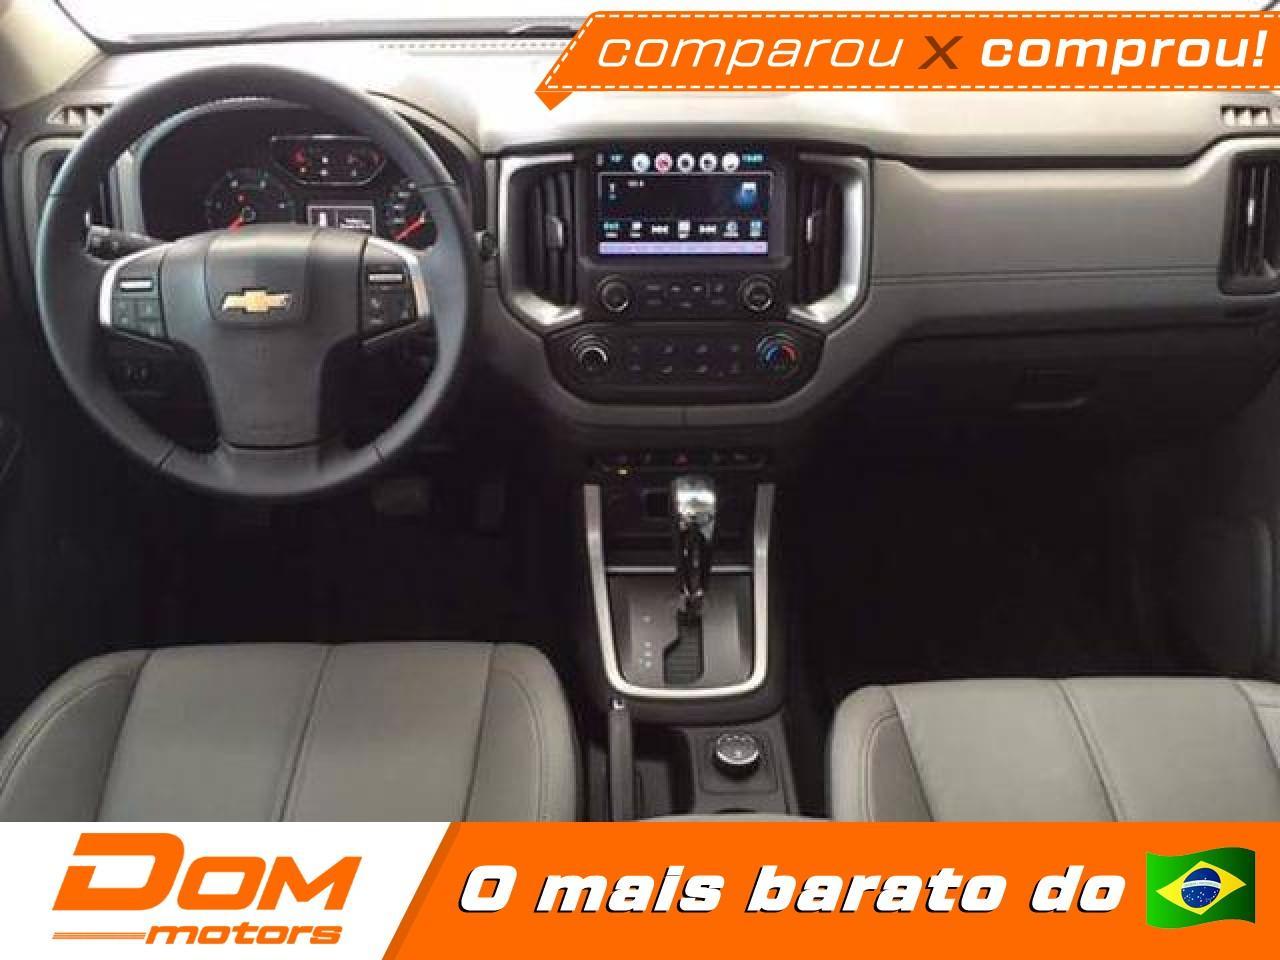 CHEVROLET S10 2.8 16V LTZ CABINE DUPLA 4X4 TURBO DIESEL AUTOMÁTICO, Foto 2